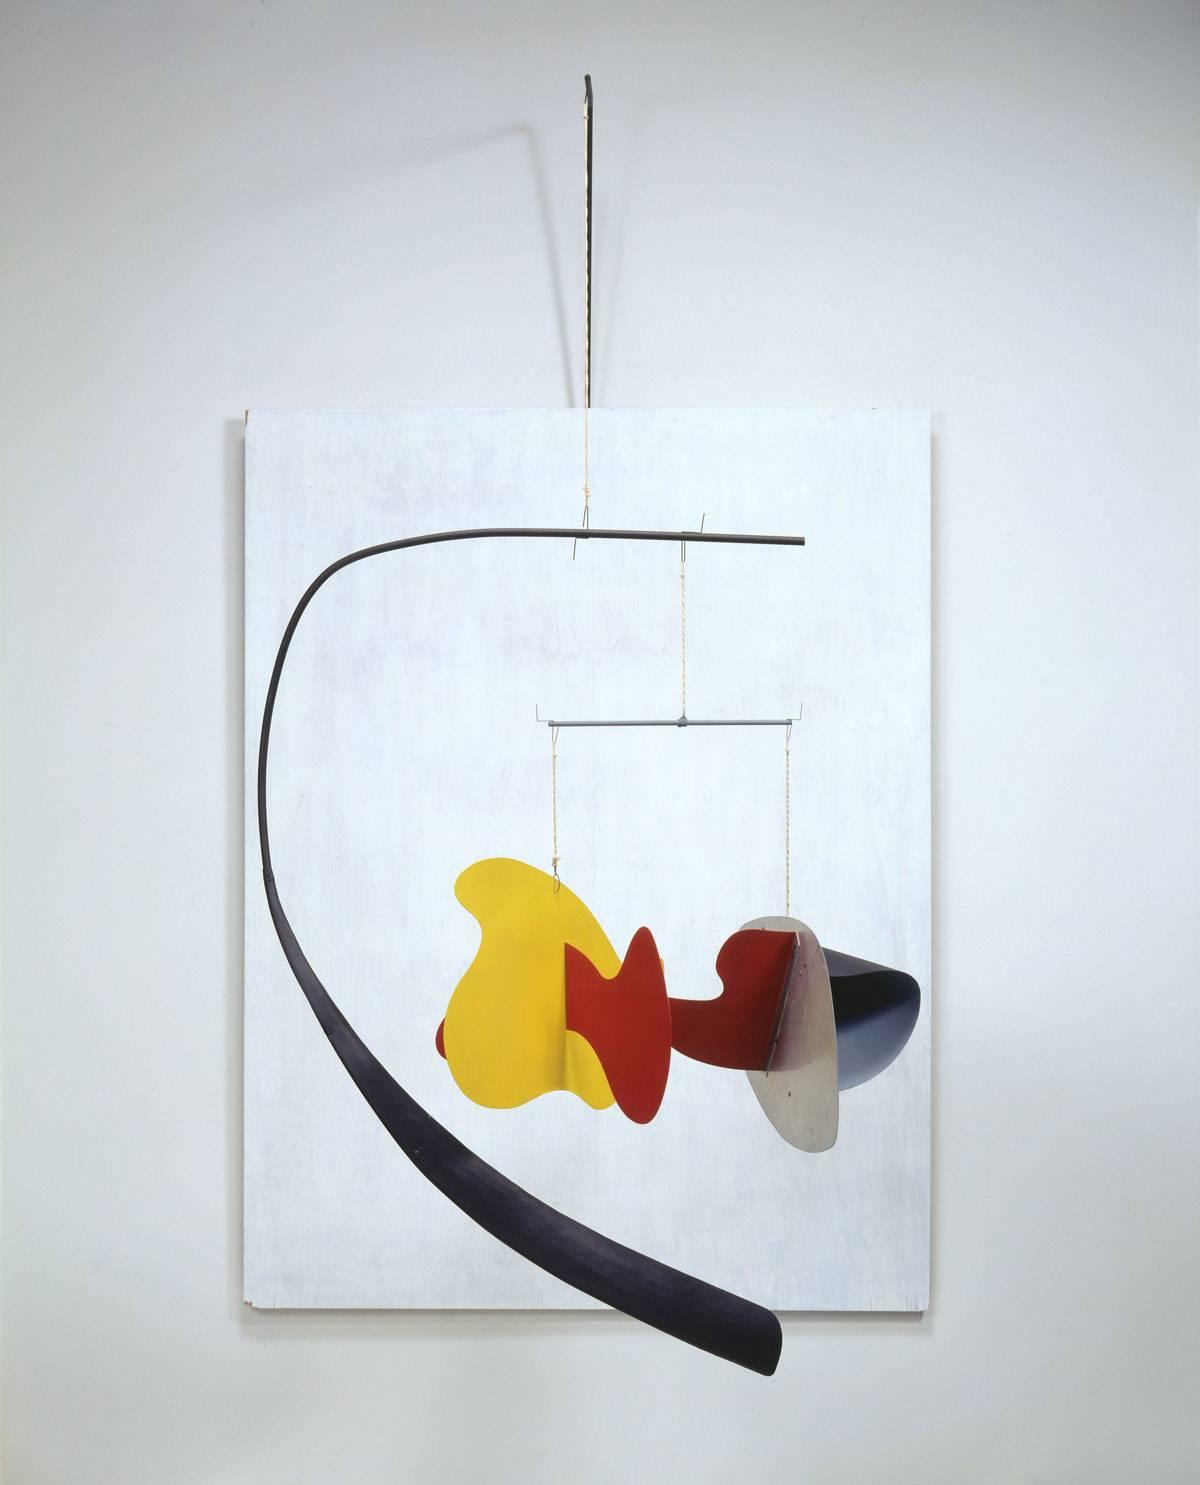 Alexander Calder, White Panel 1936. Calder Foundation, New York / Art Resource, NY